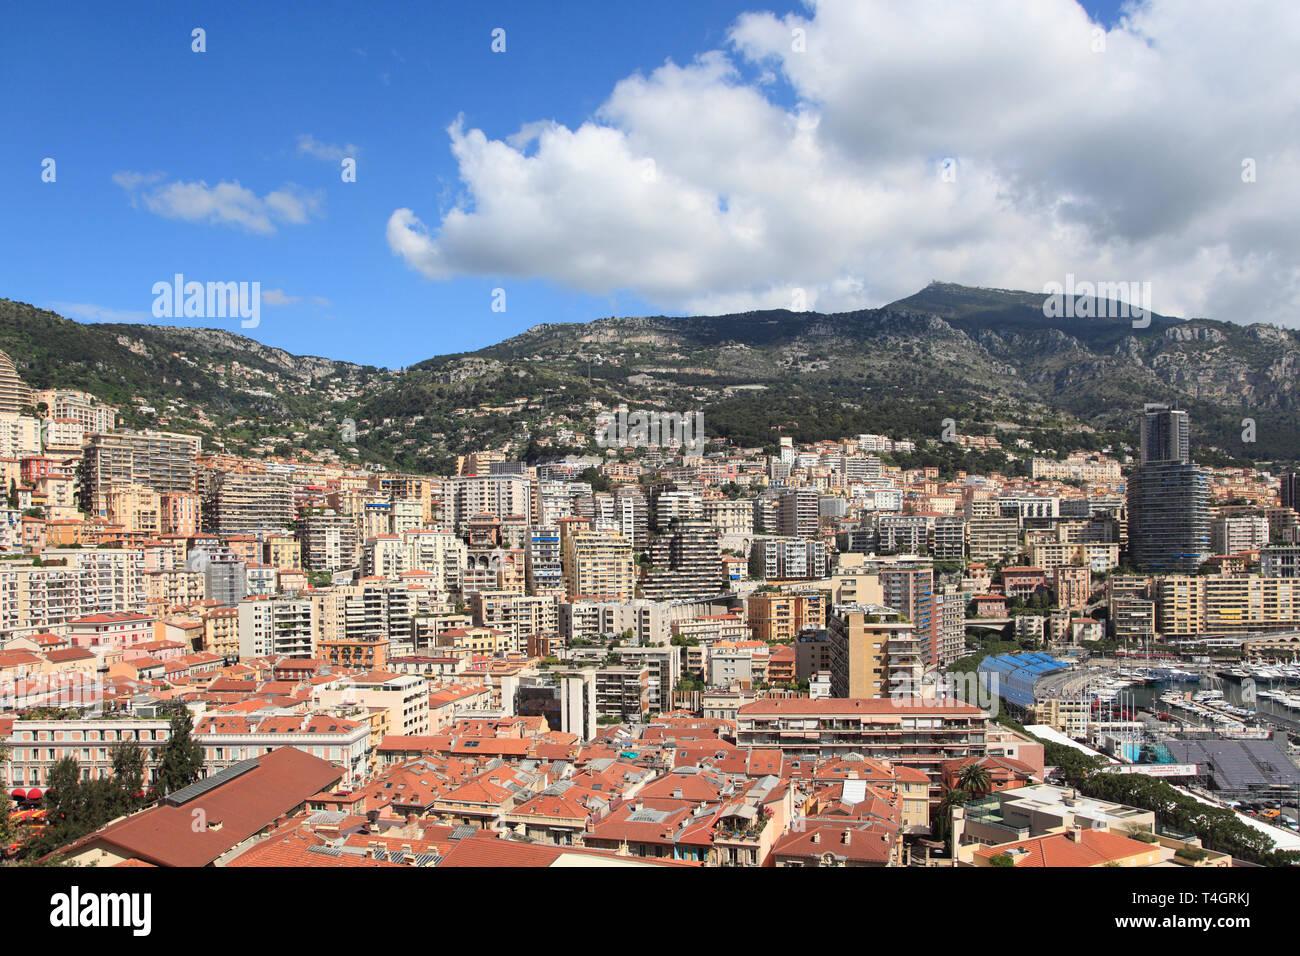 Highrises,La Condamine, Monaco, Cote d Azur, Mediterranean, Europe - Stock Image